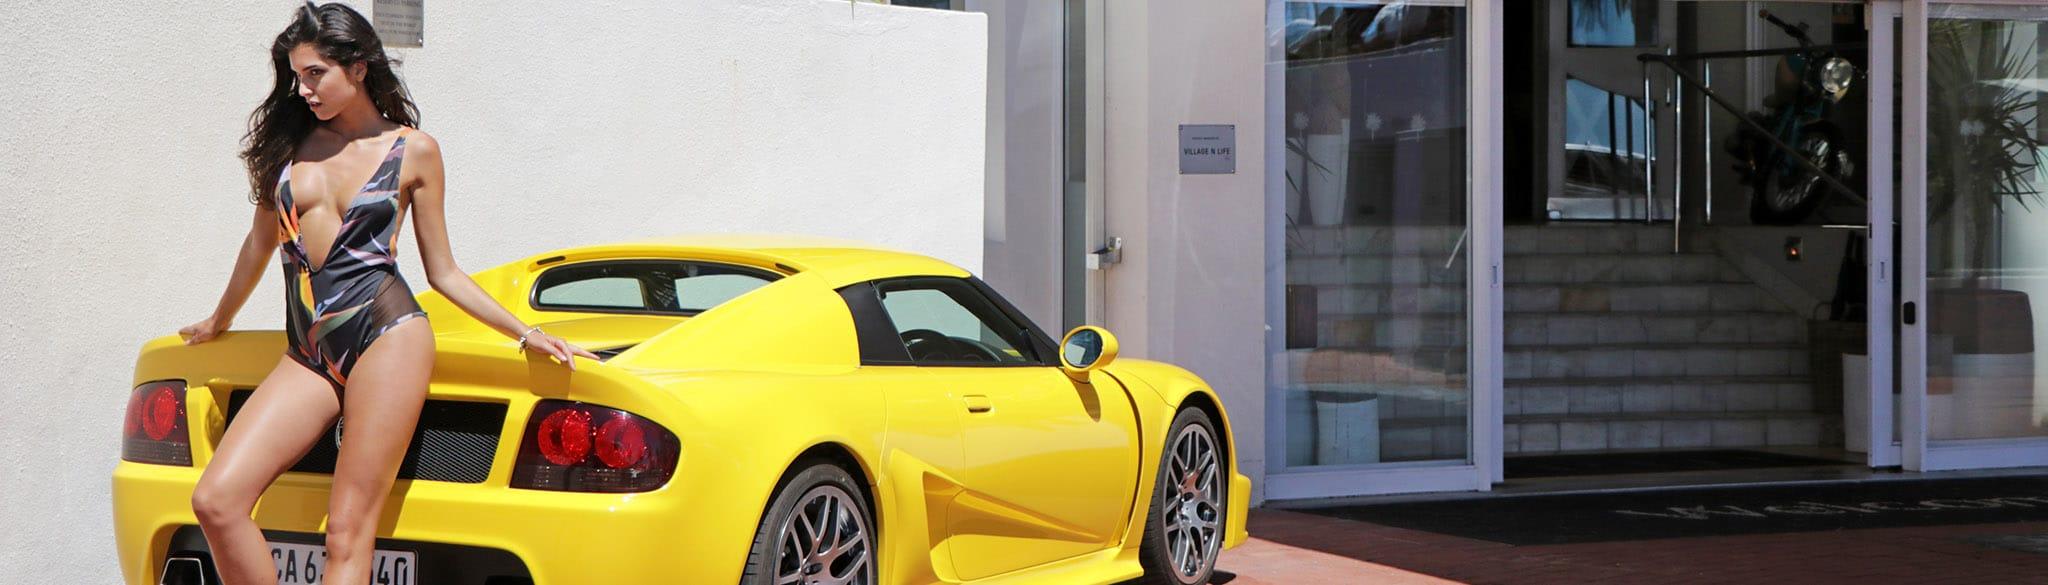 Sandy B Parking Model